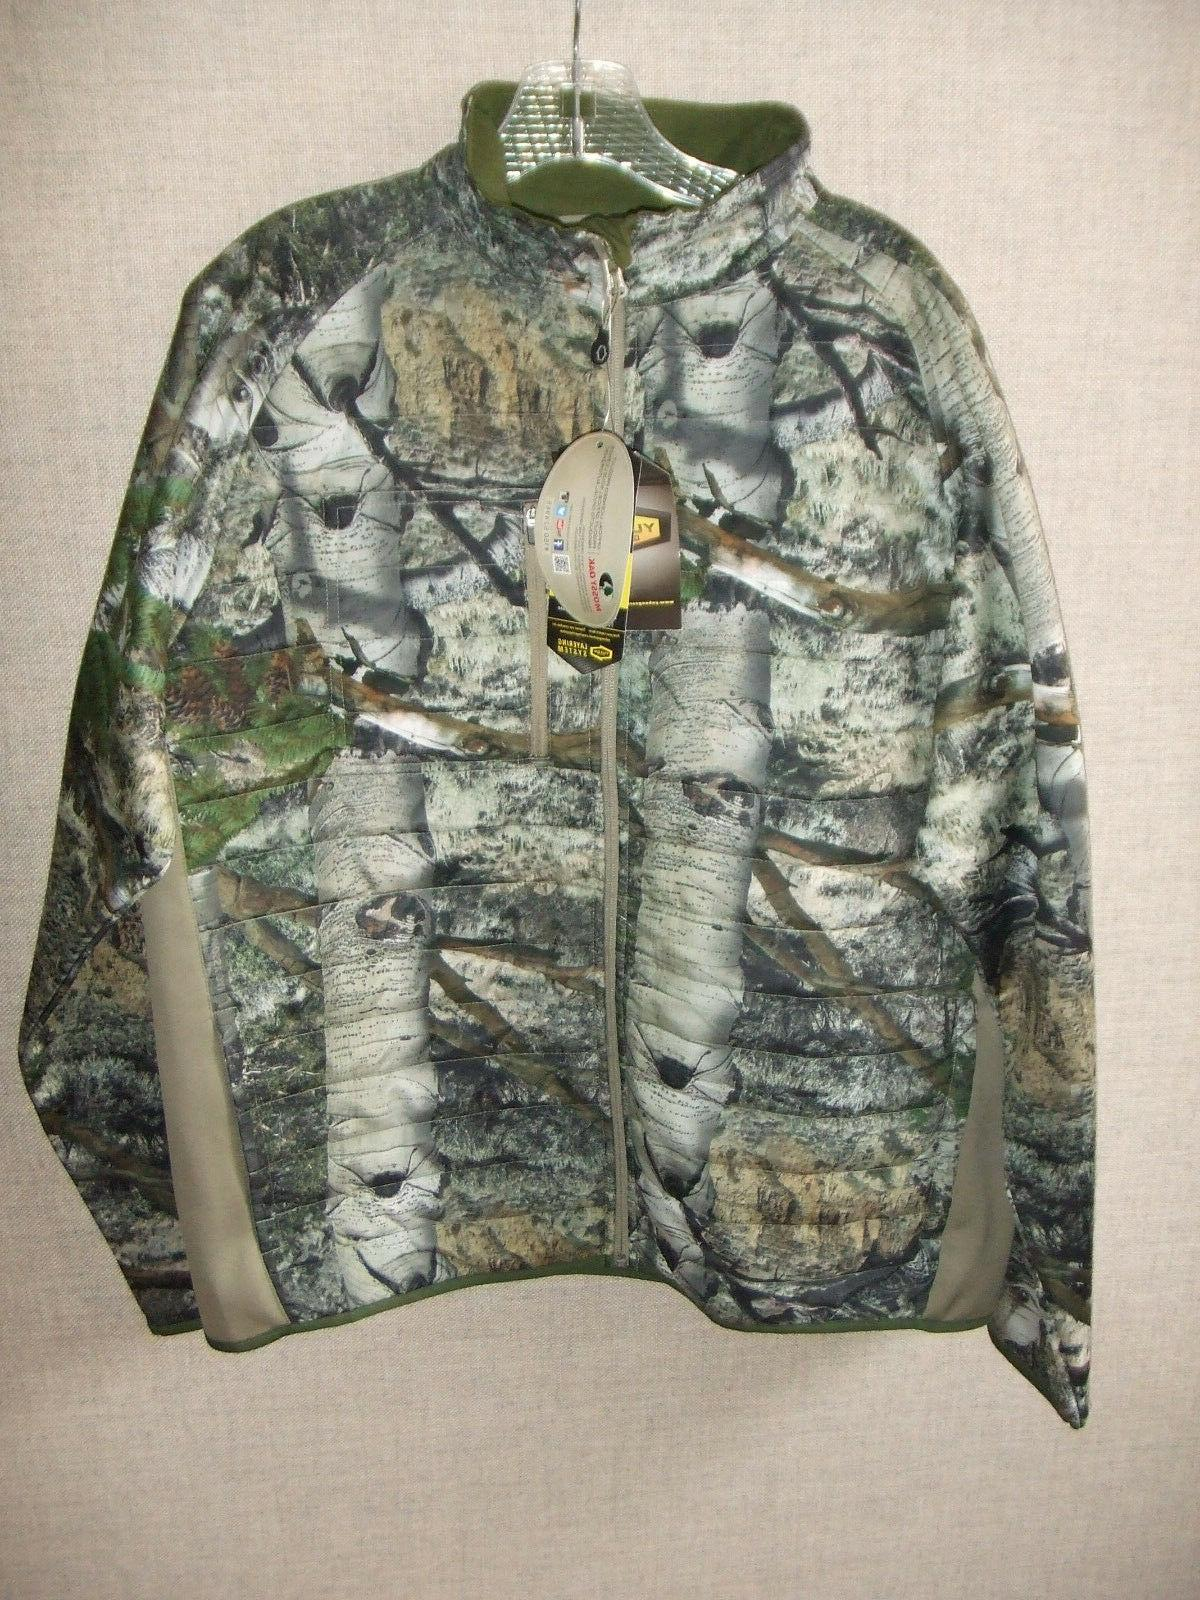 Mossy Oak Yukon Gear L sz Layering System Body Heat Design H